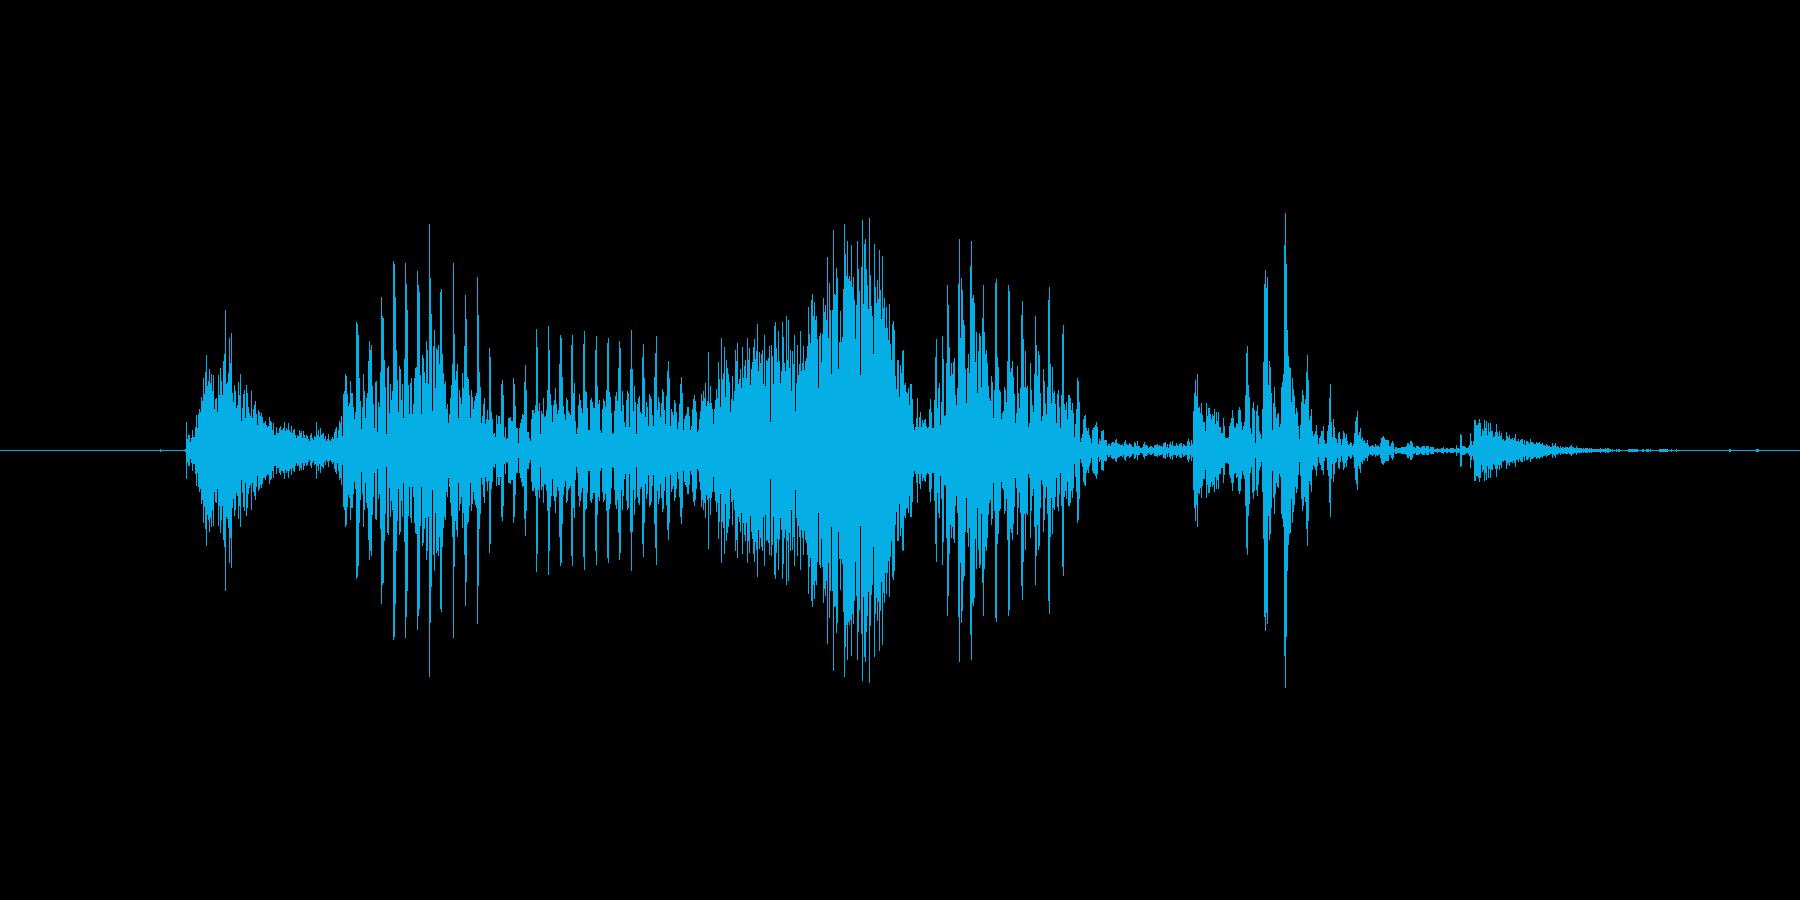 「22nd/twenty-second」の再生済みの波形